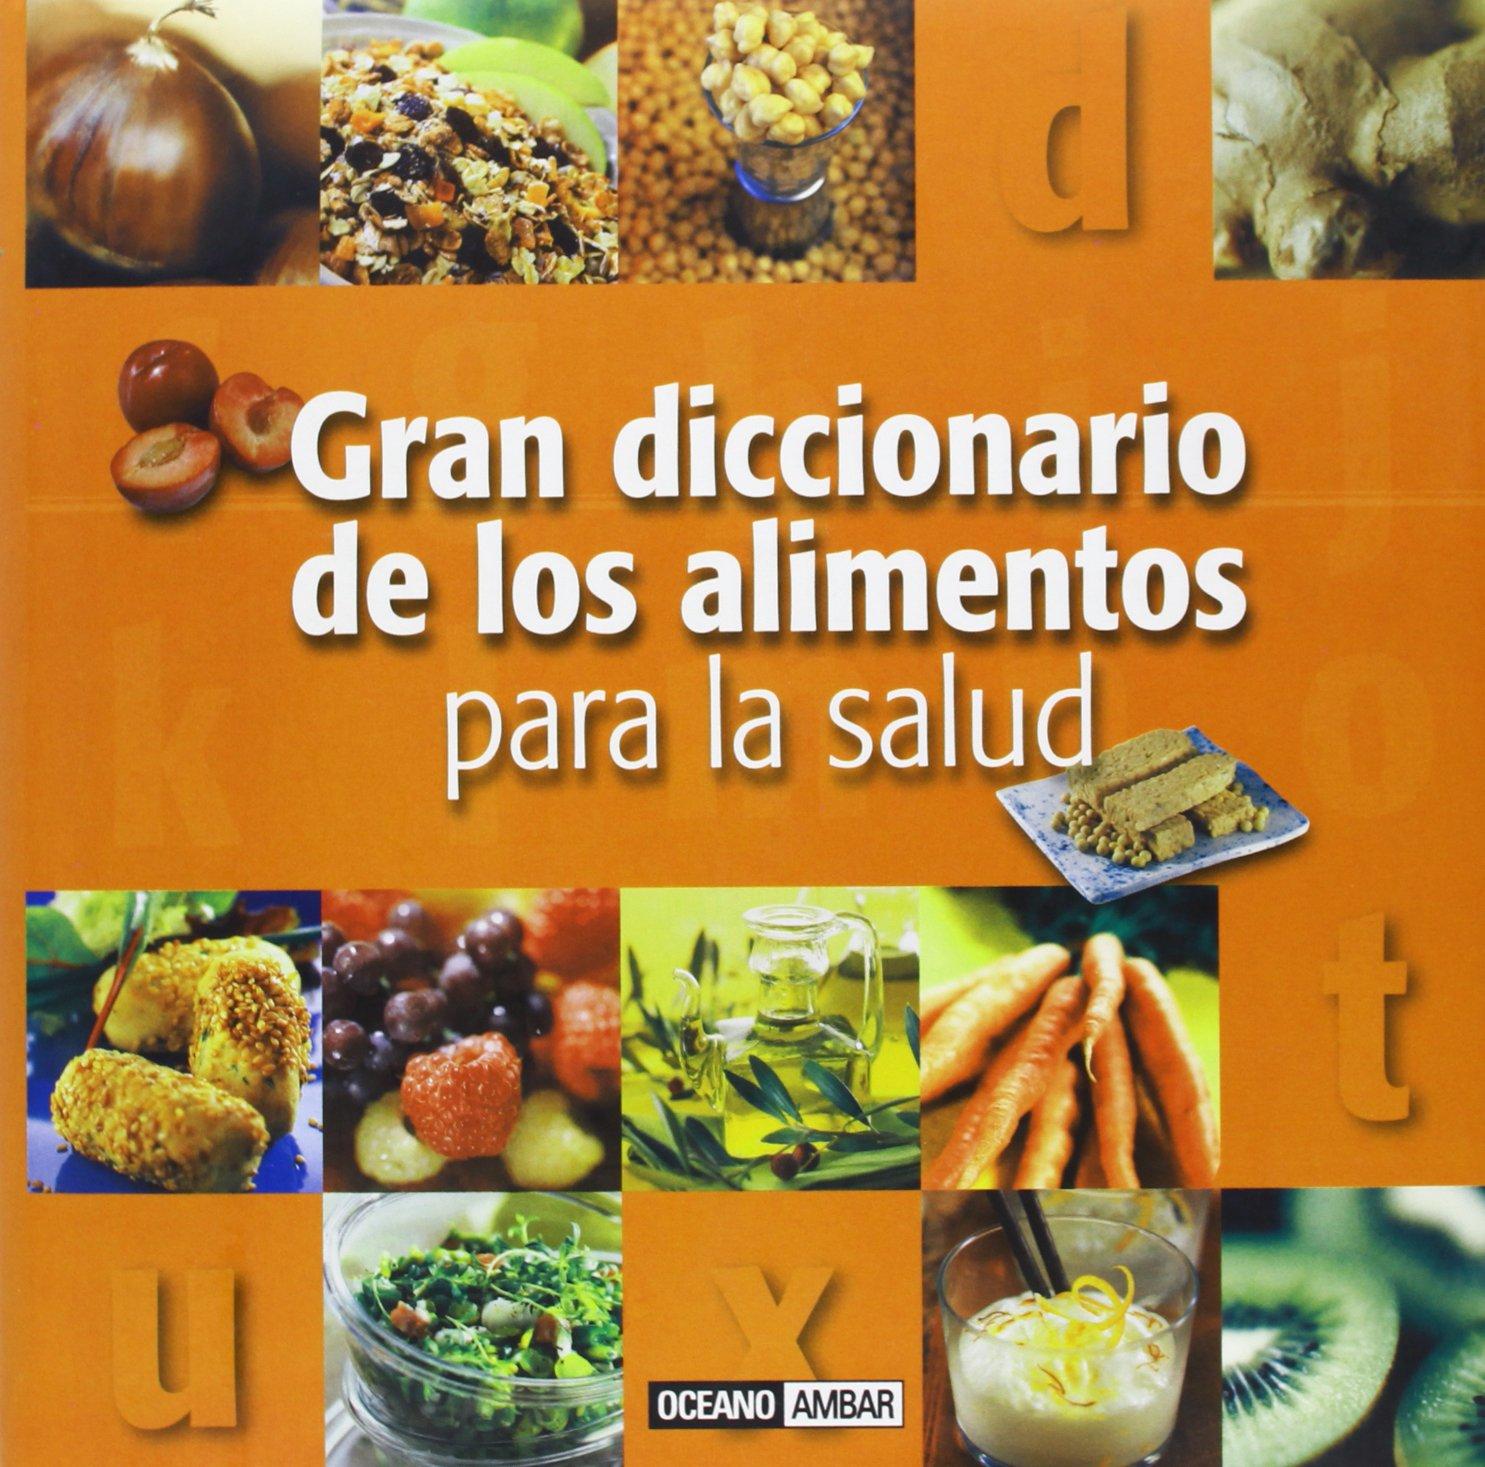 dieta equilibrada in spanish meaning